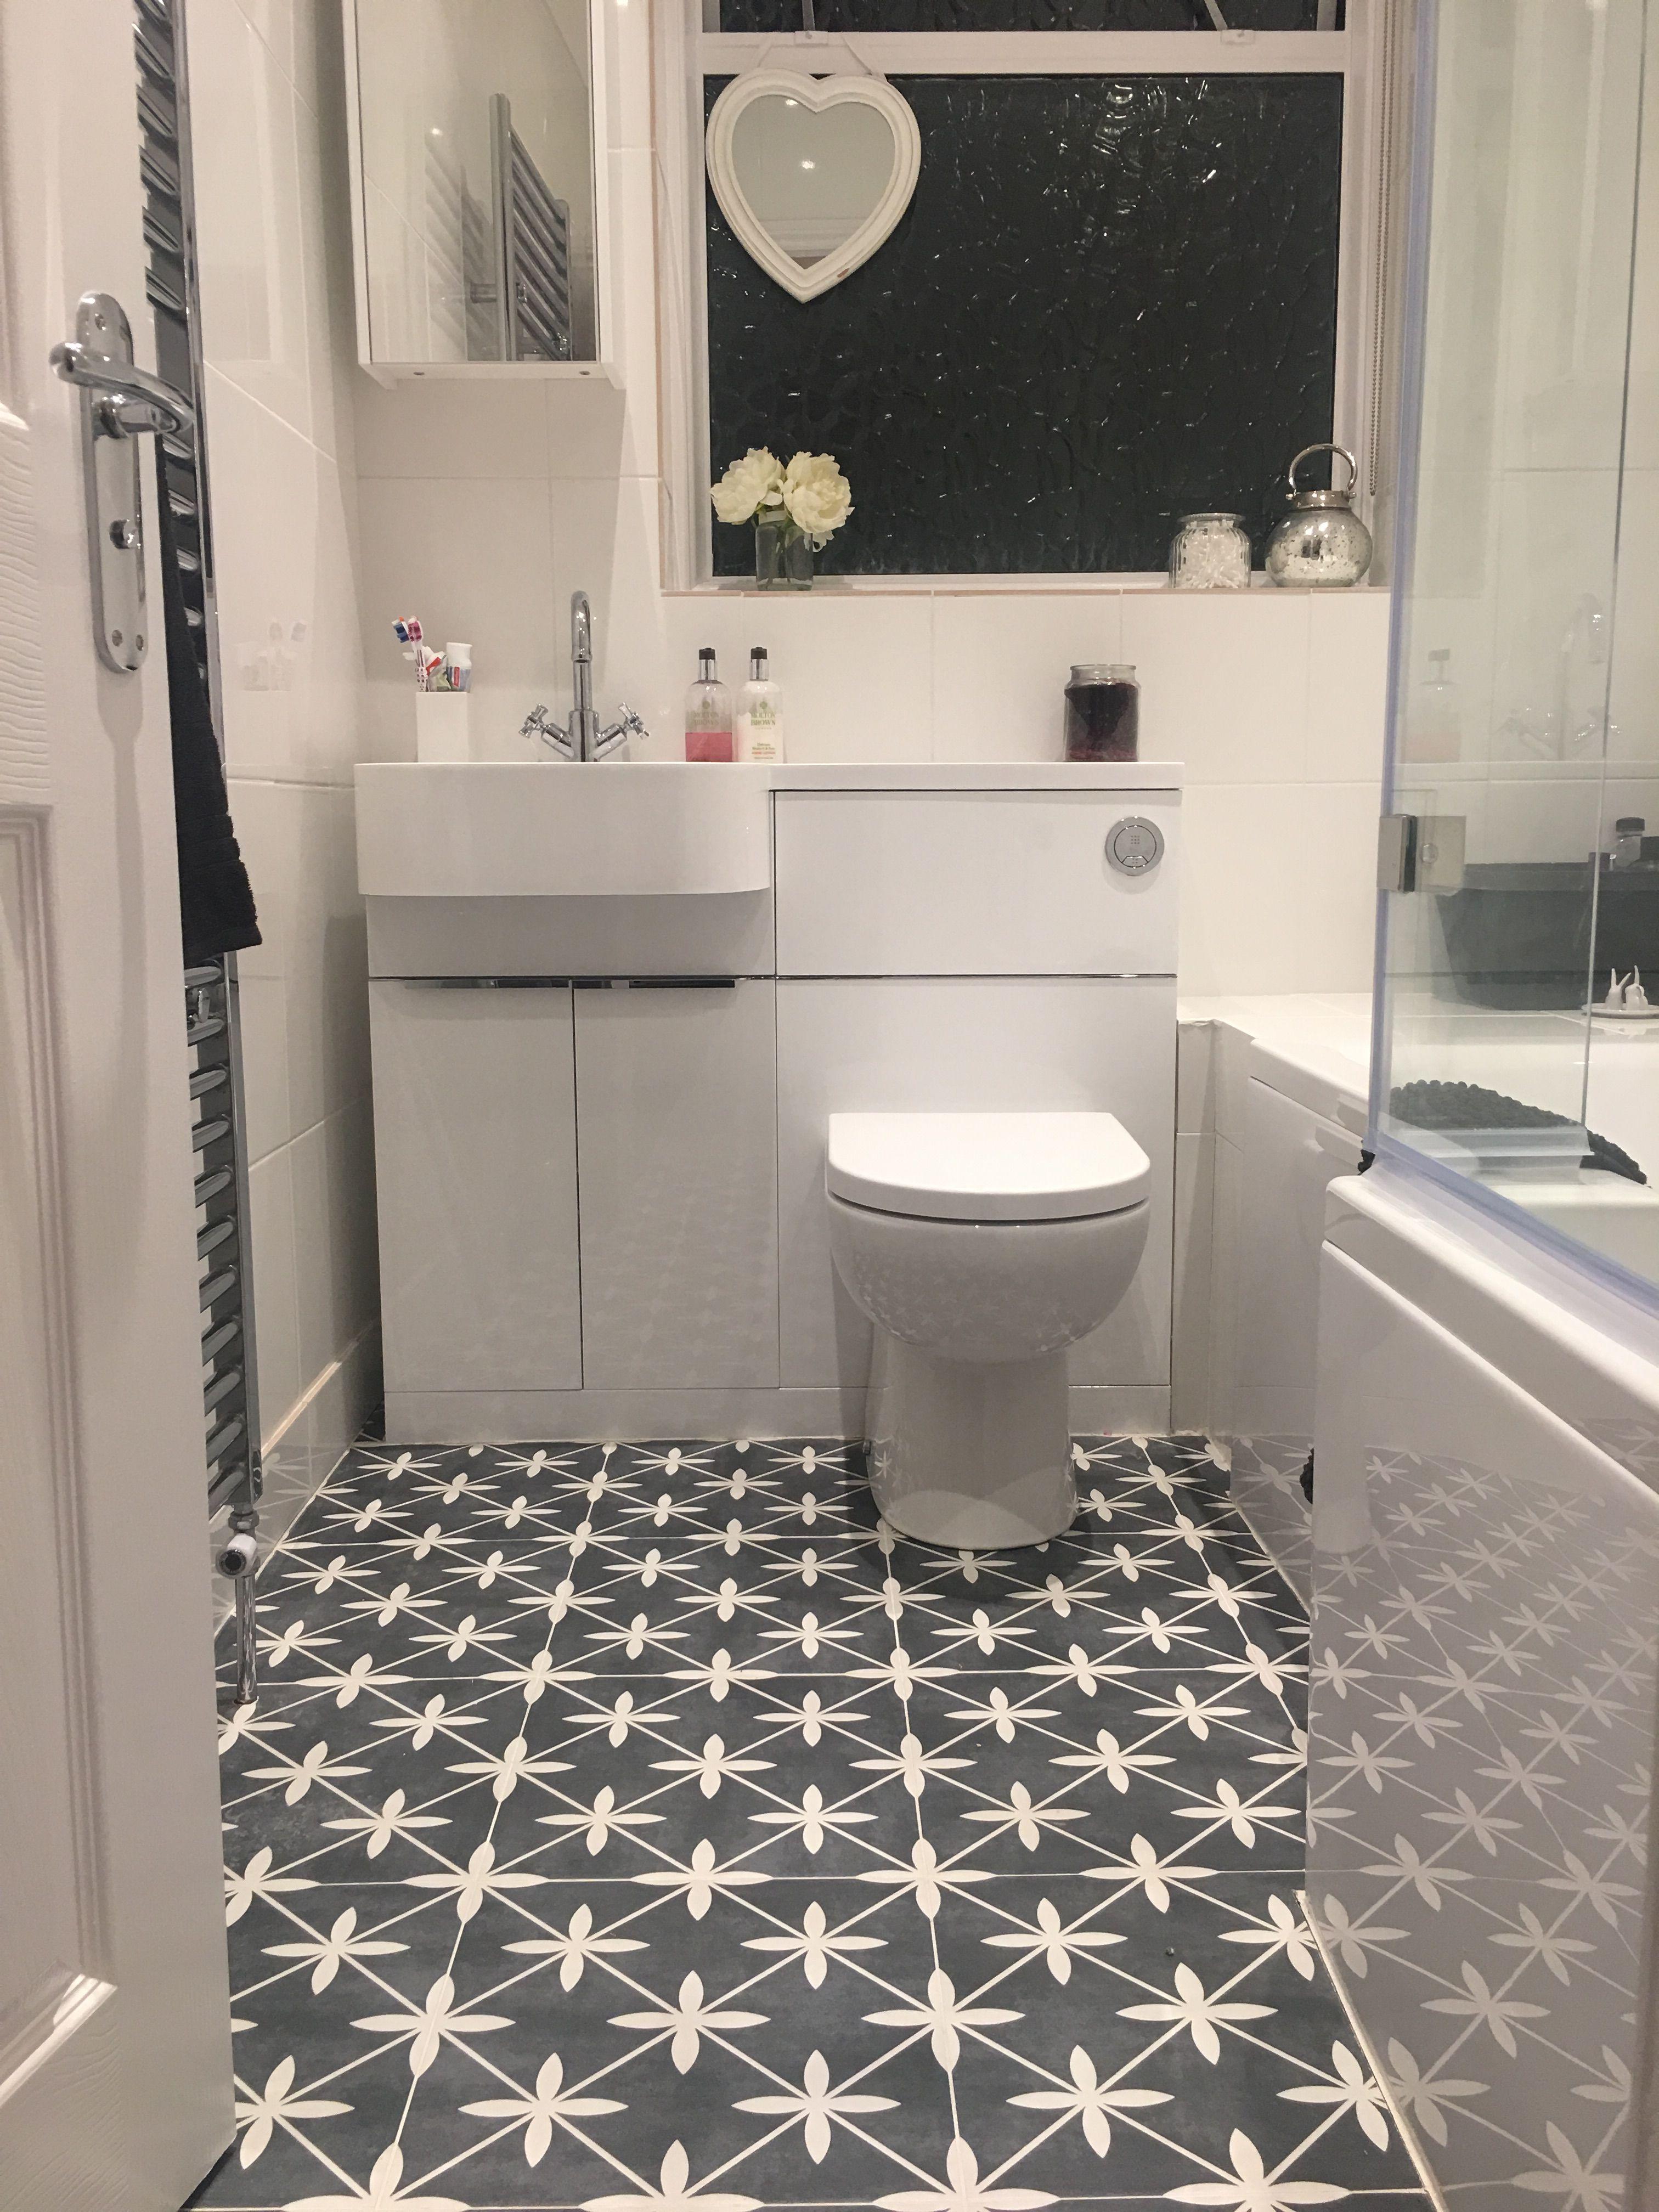 Laura Ashley Bathroom Floor Tiles | Small bathroom, Small ...